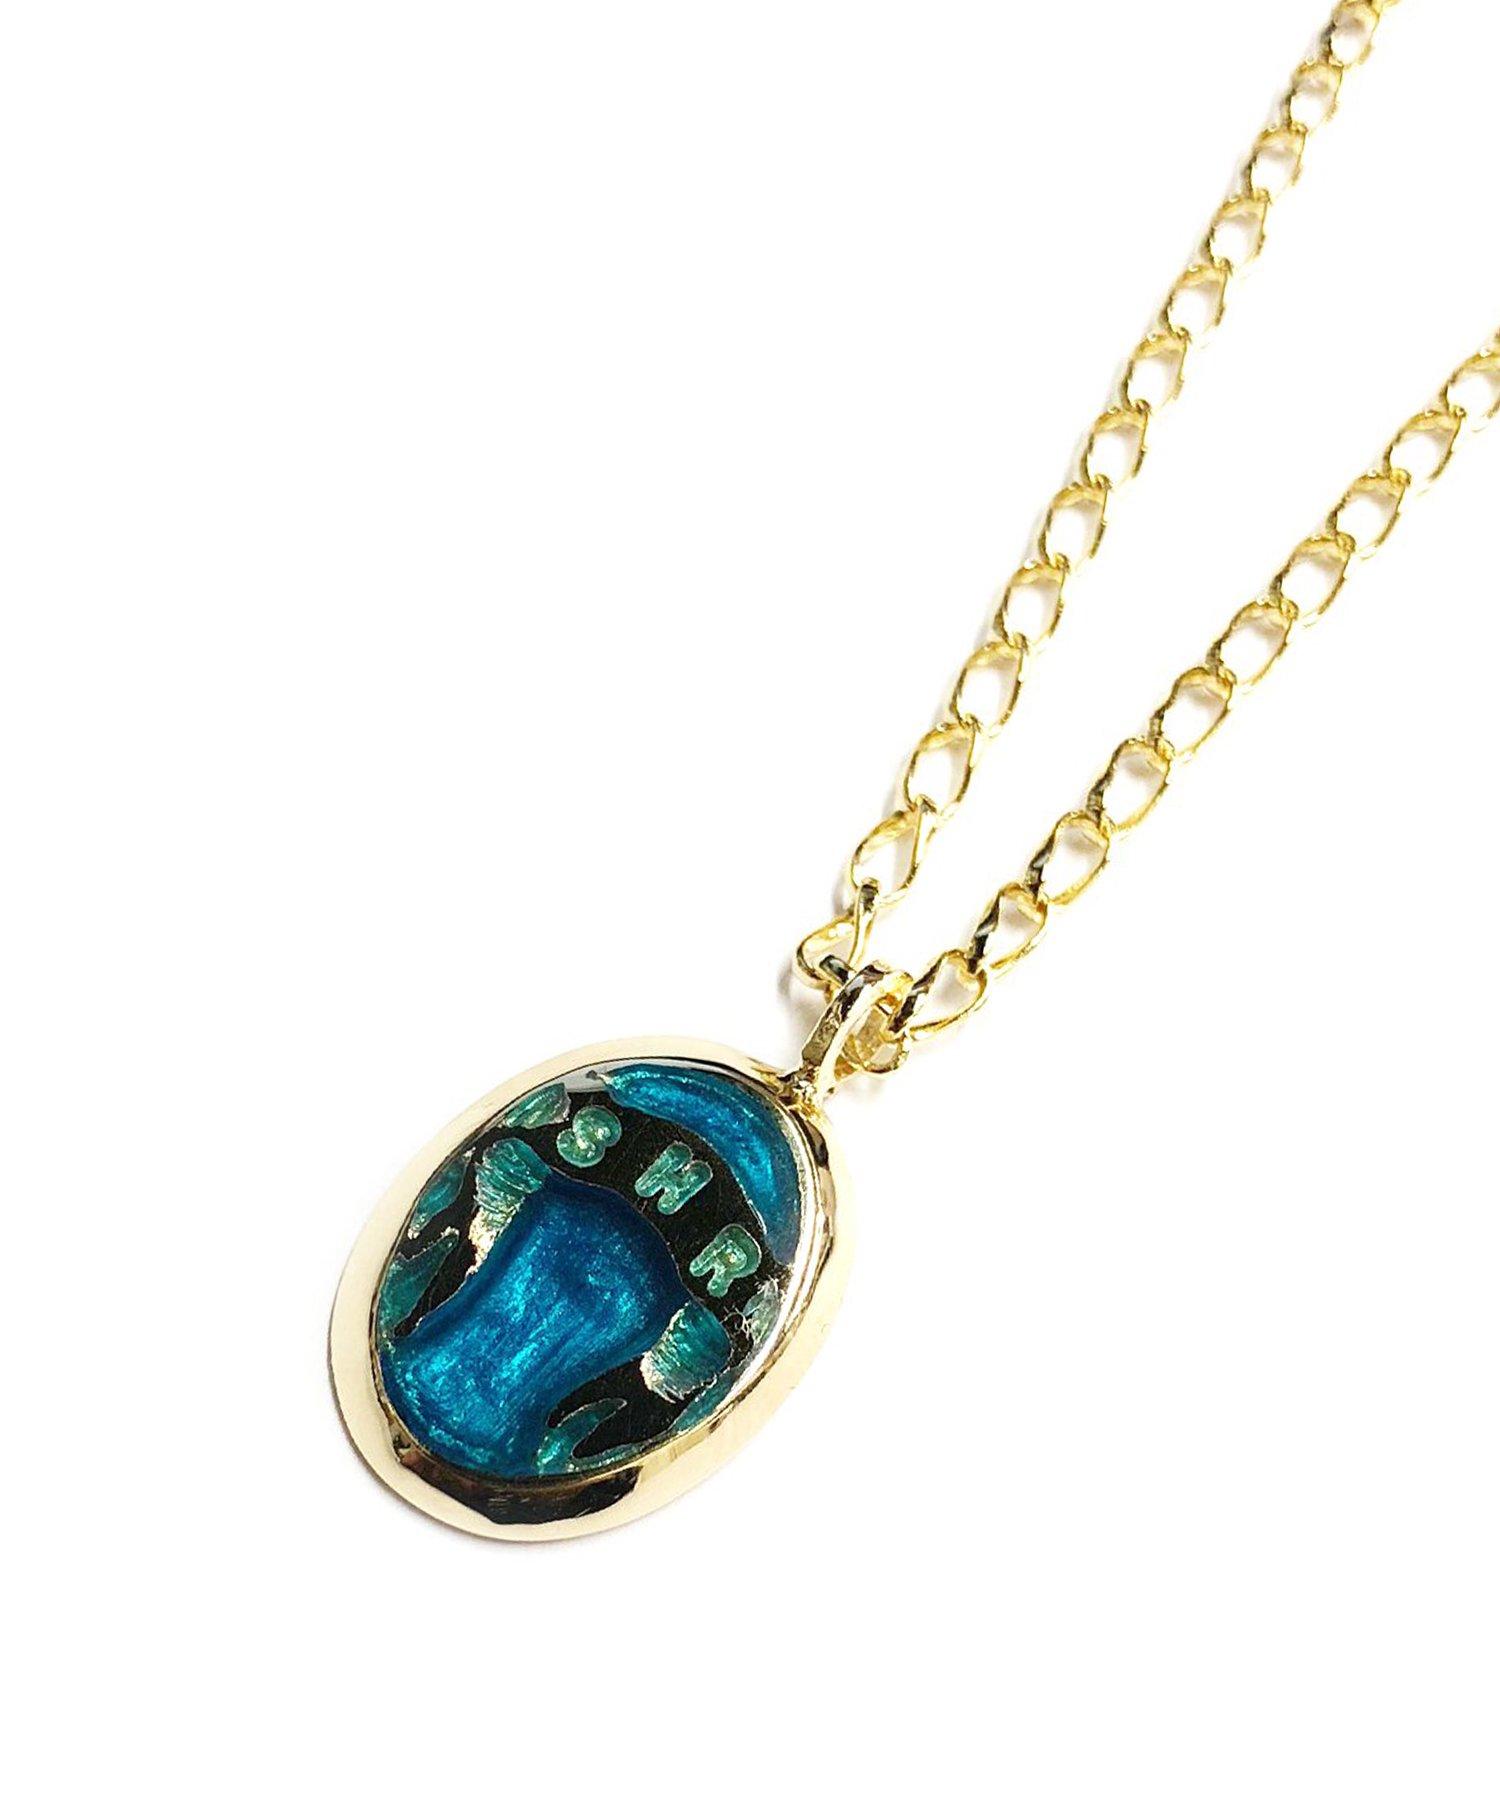 SAHRIVAR(シャフリーヴァル)Enameled Necklace(Brass×18K Plating)エナメルBLUE